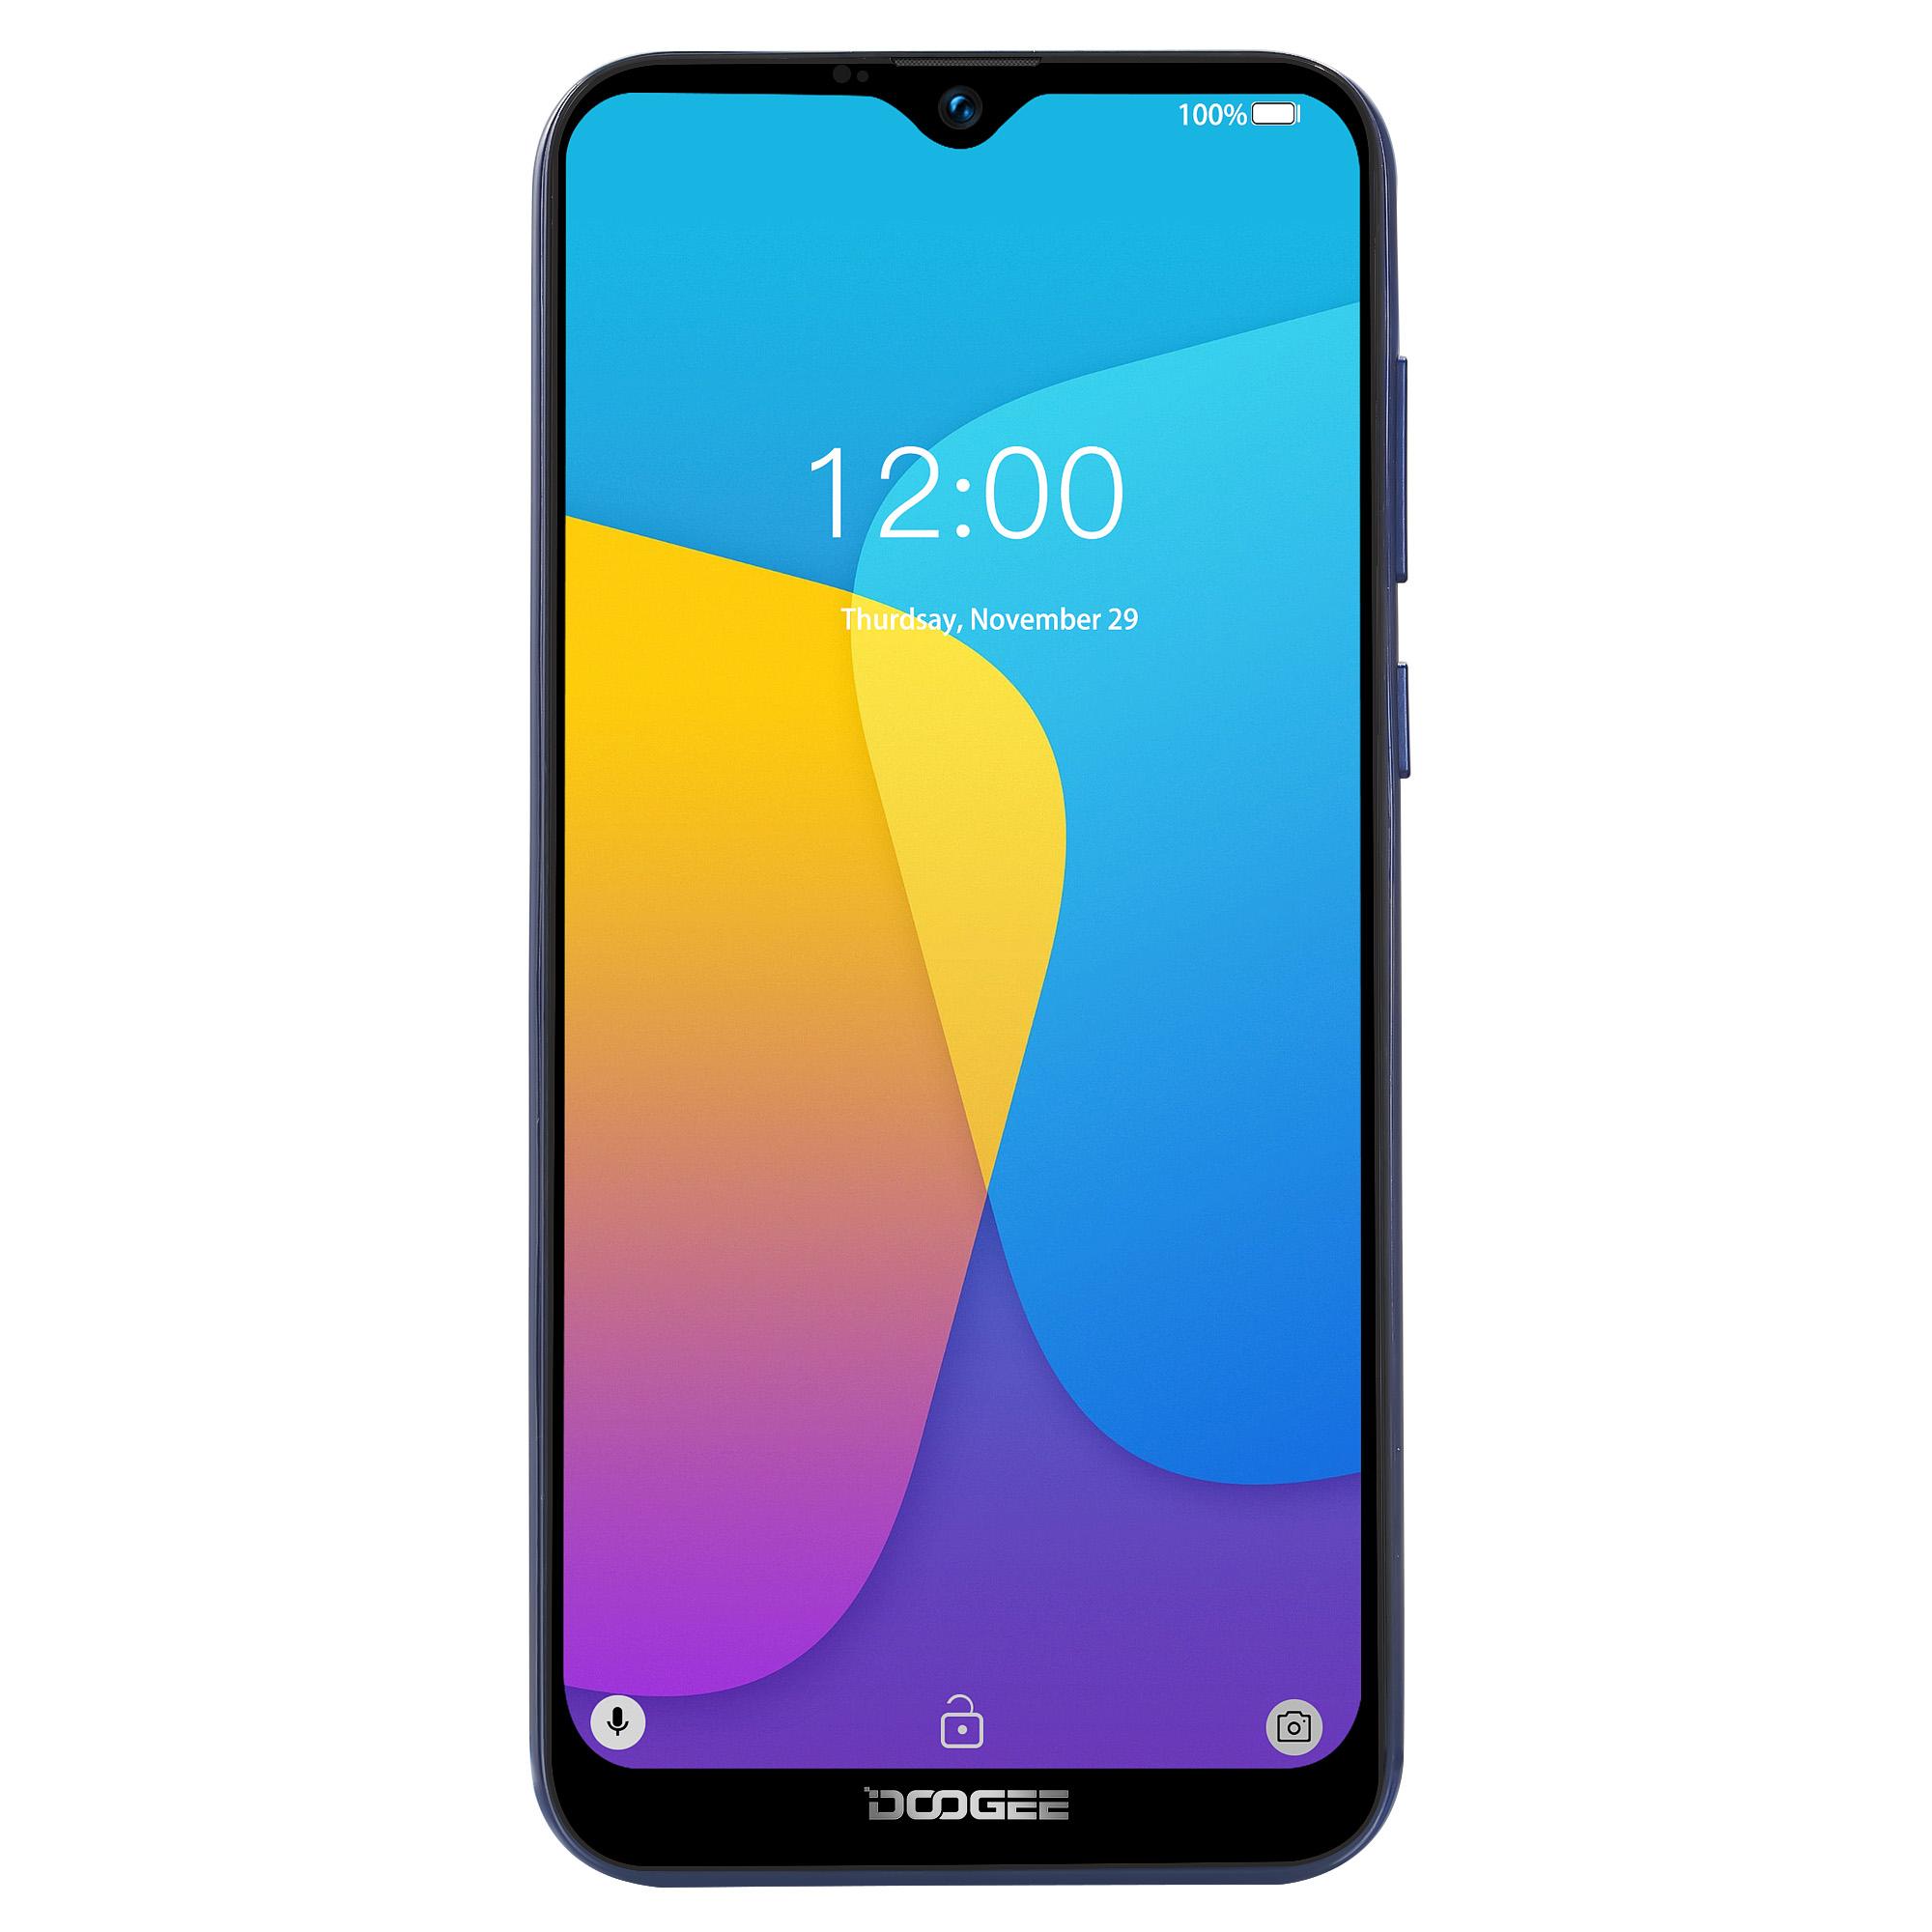 DOOGEE X90 Cellphone 6.1inch 19:9 Waterdrop LTPS Screen Smartphone Quad Core CPU 1GB RAM+16GB ROM 3400mAh Battery Dual SIM Cards 8MP+5MP Camera Android 8.1 OS  Blue_European version